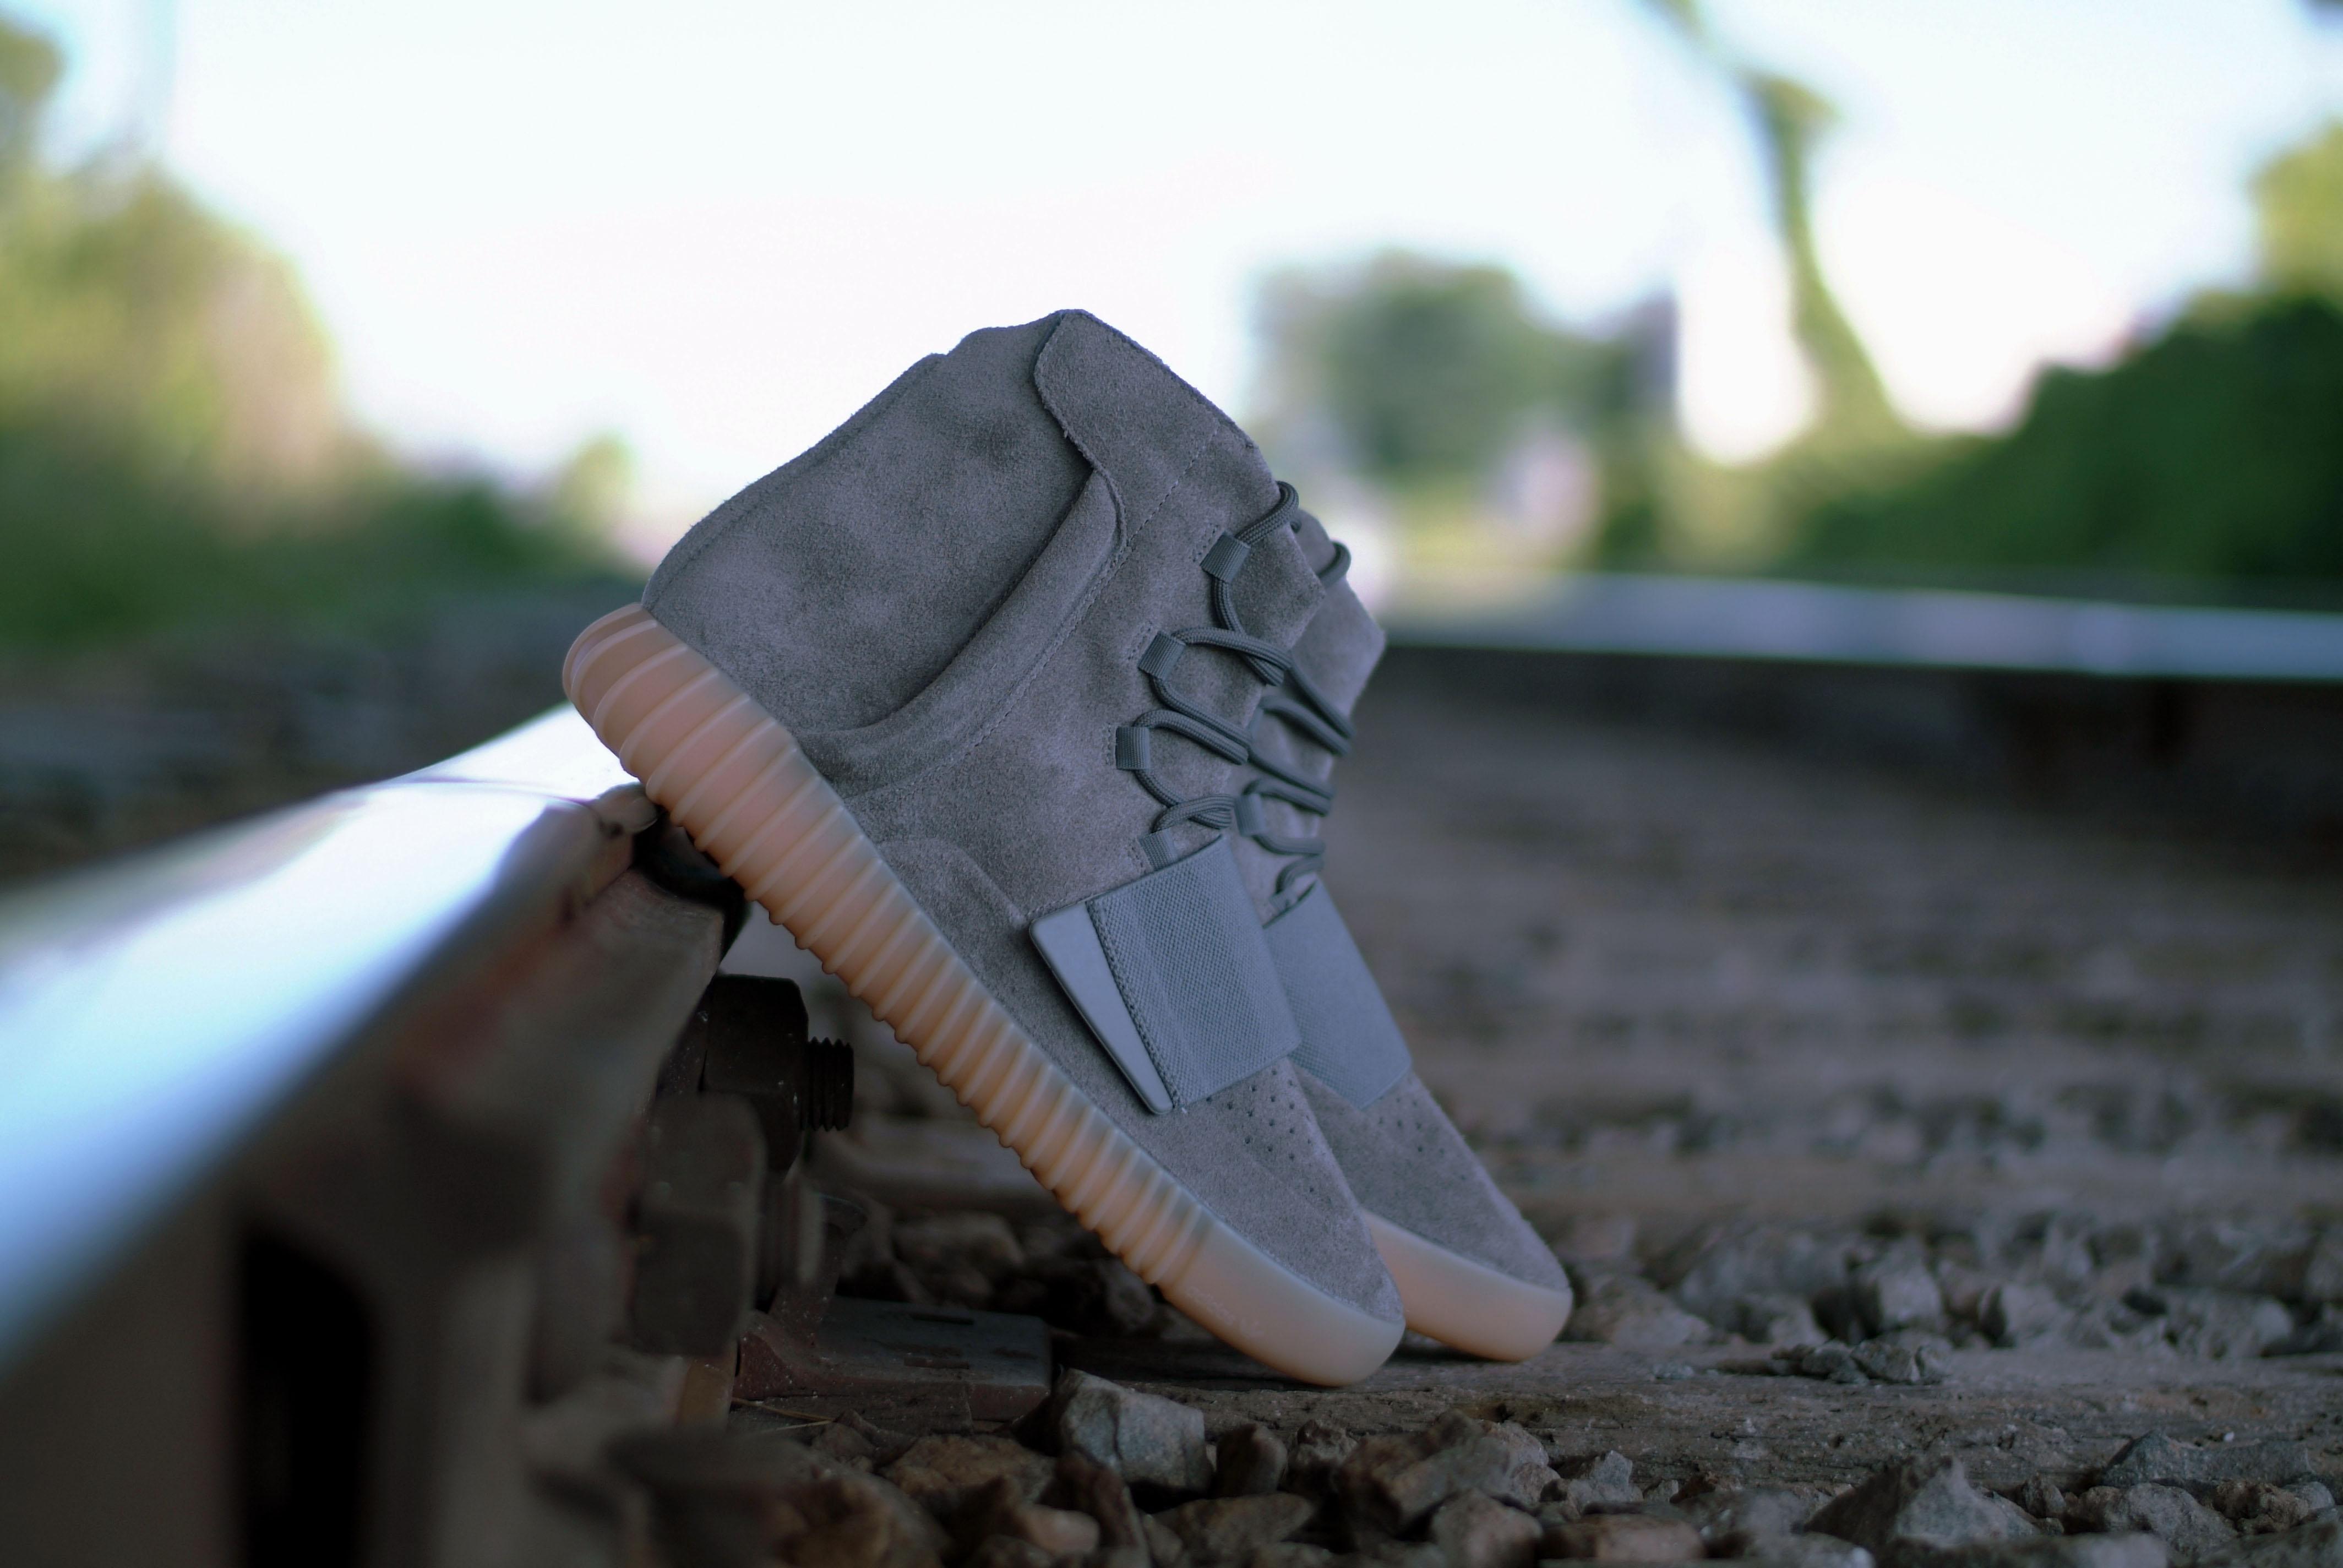 Yeezy Boost 750. Adidas Yeezy Boost 750 Light Grey Gum ... 96dbf9ab72